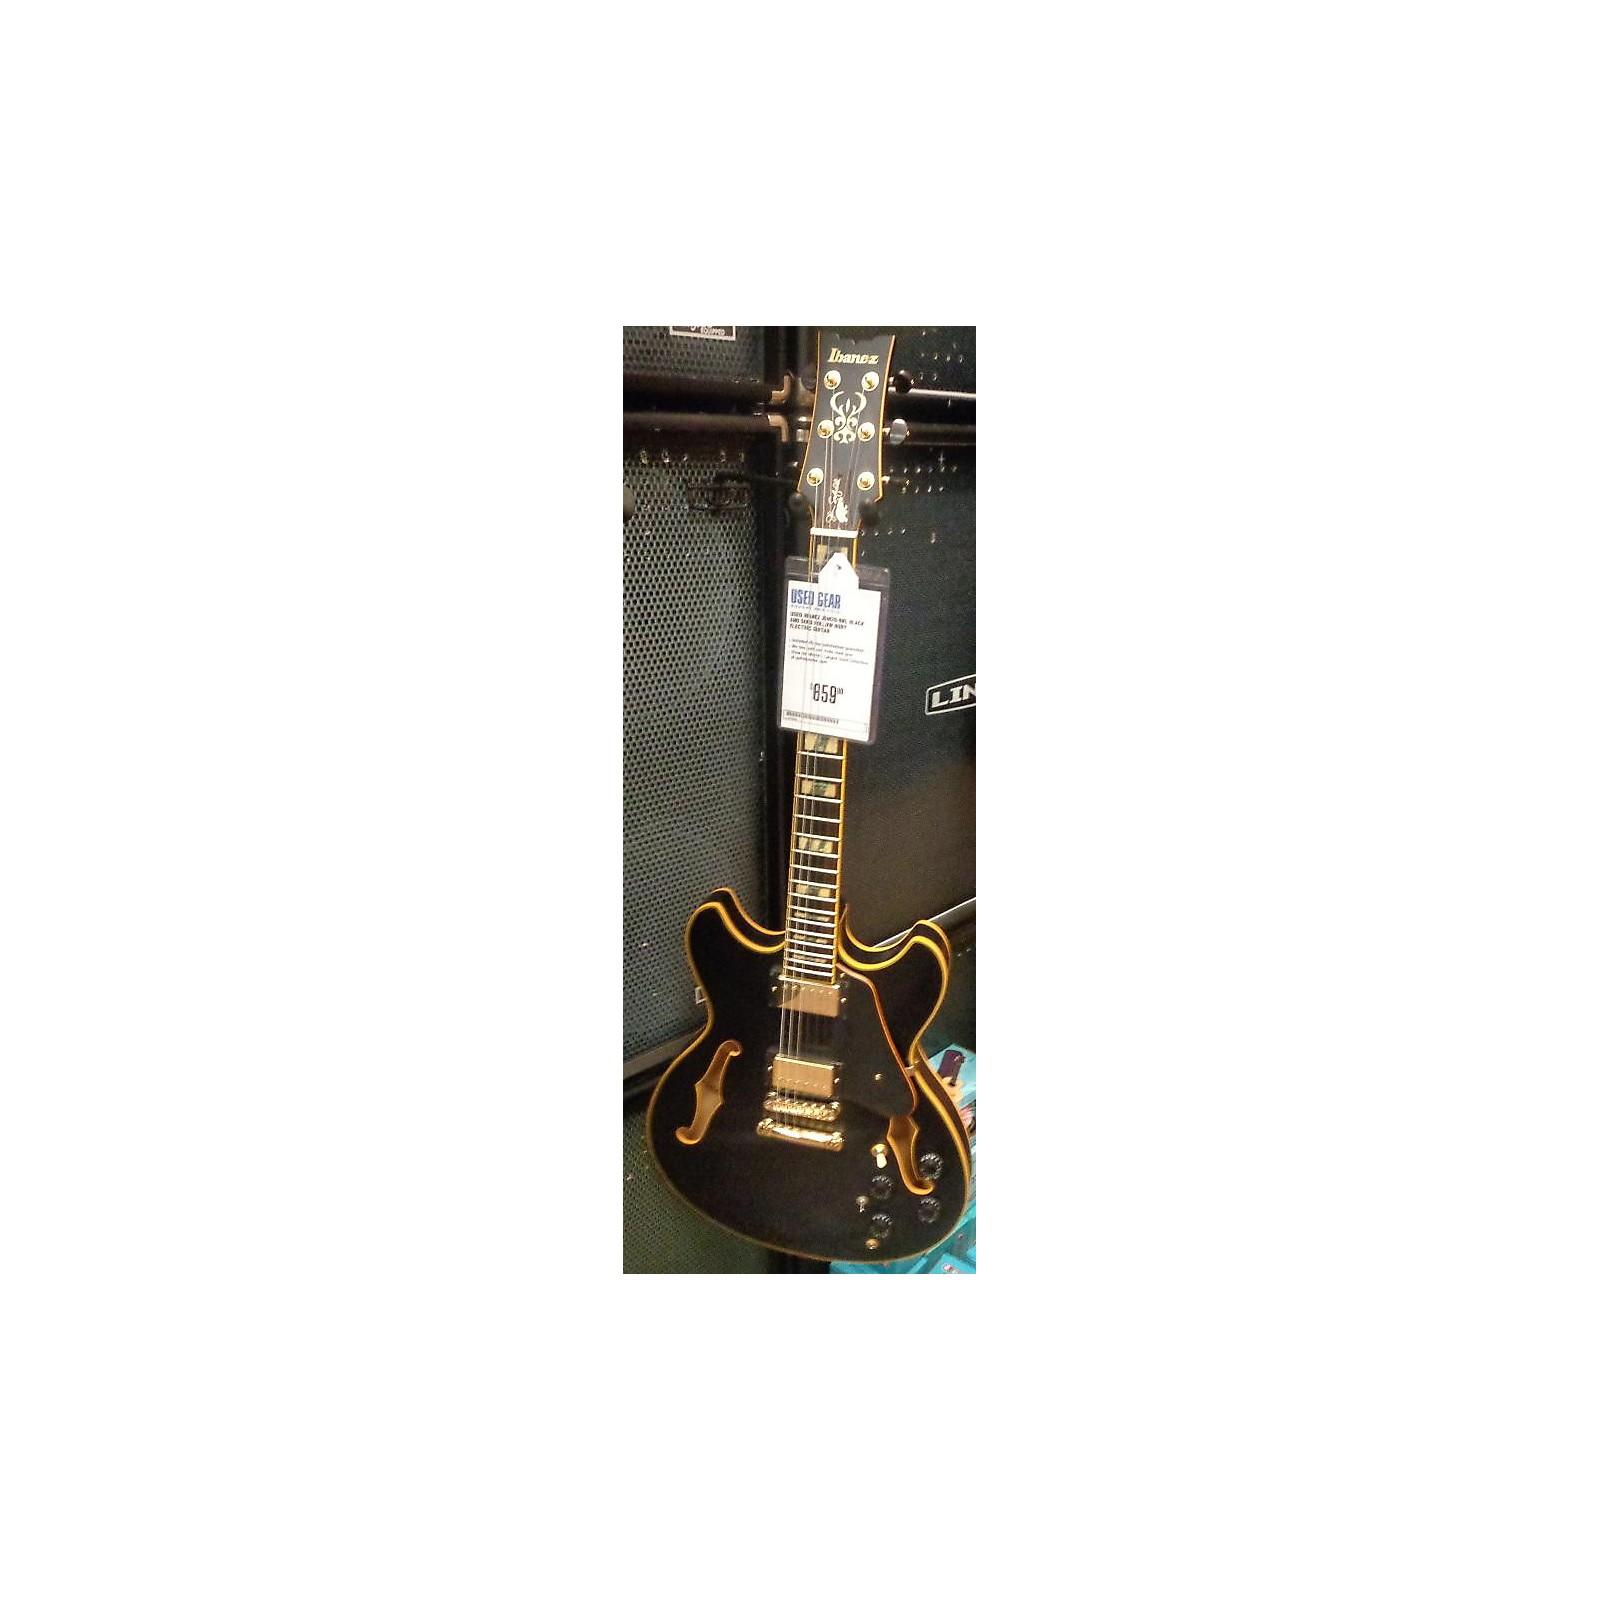 Ibanez JSM20-BKL Hollow Body Electric Guitar